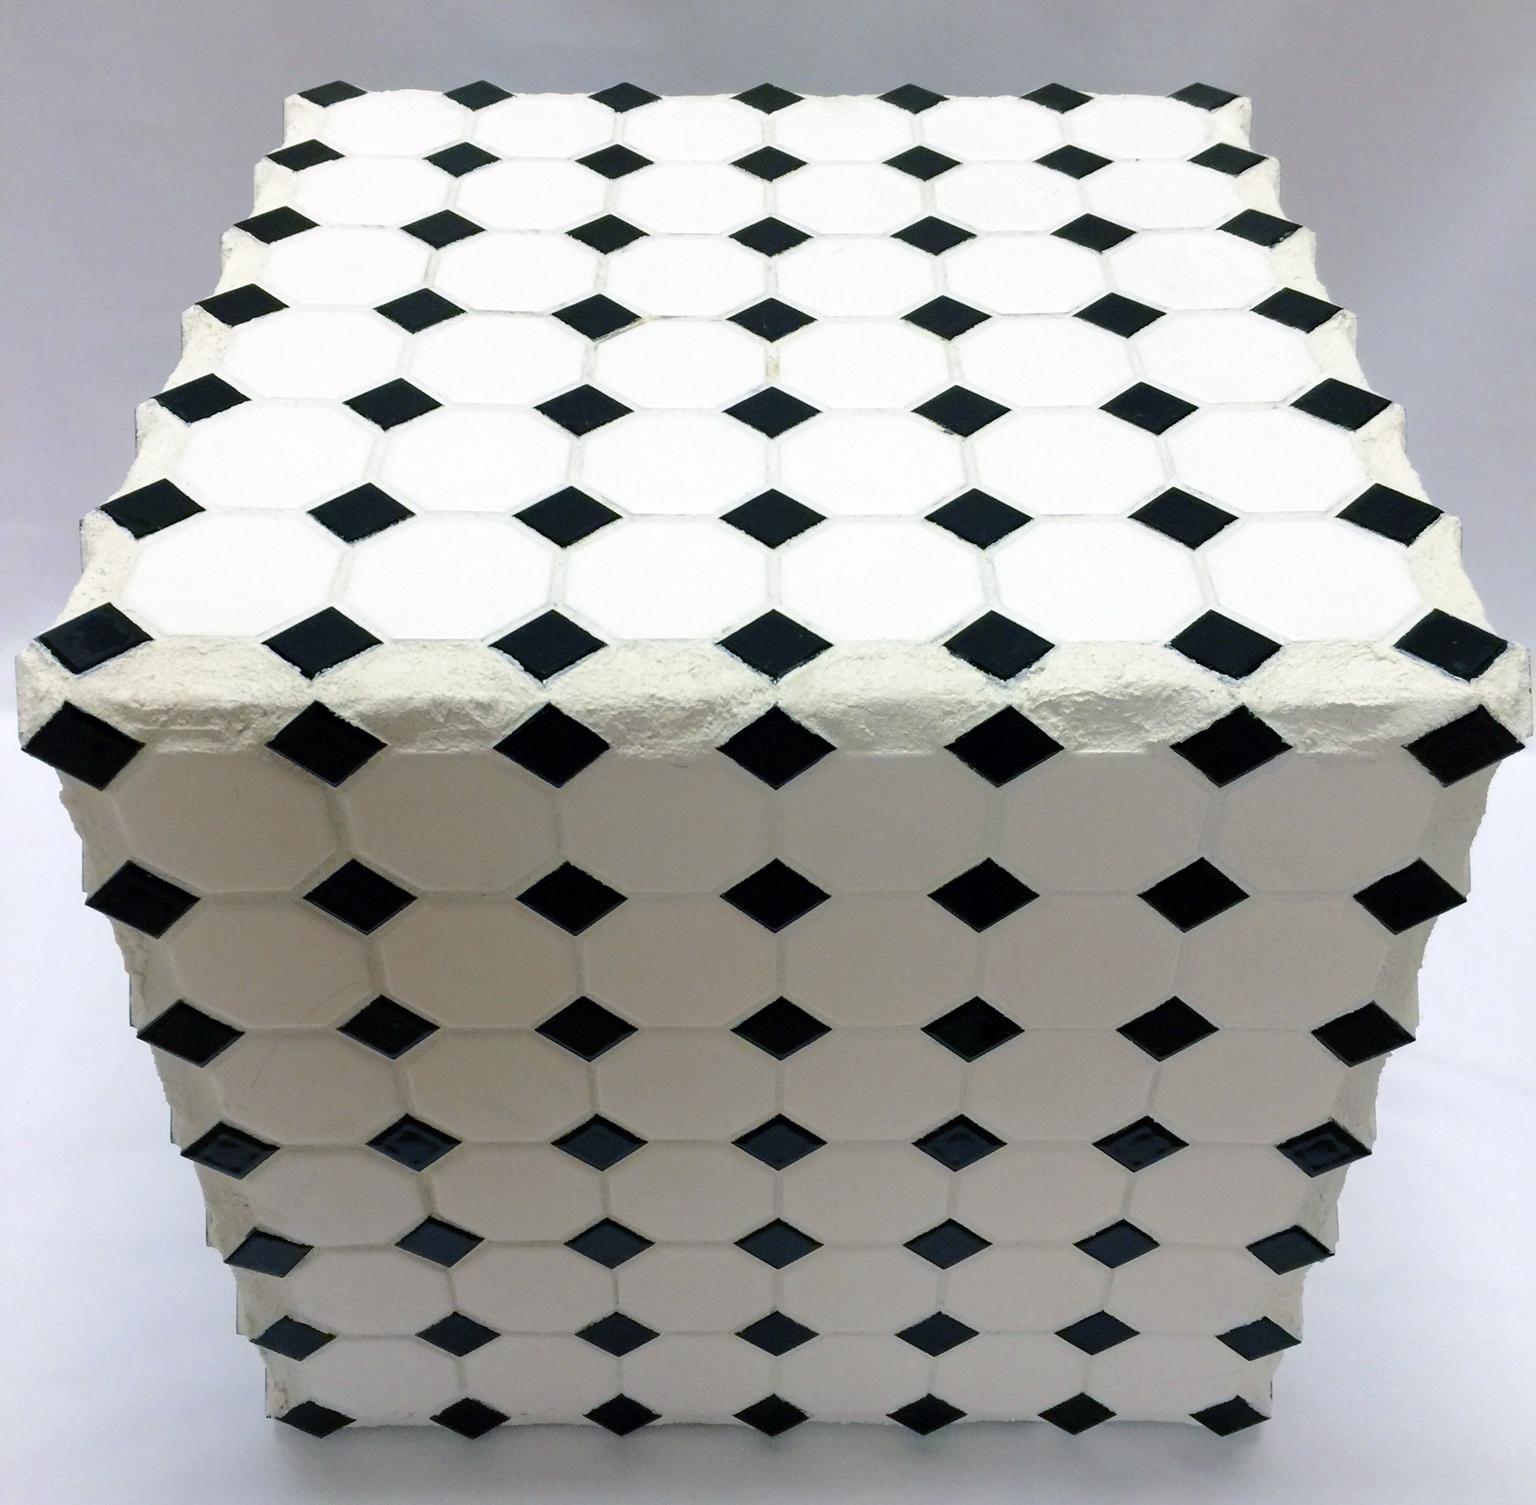 Black and White Diamond (Cube Table)